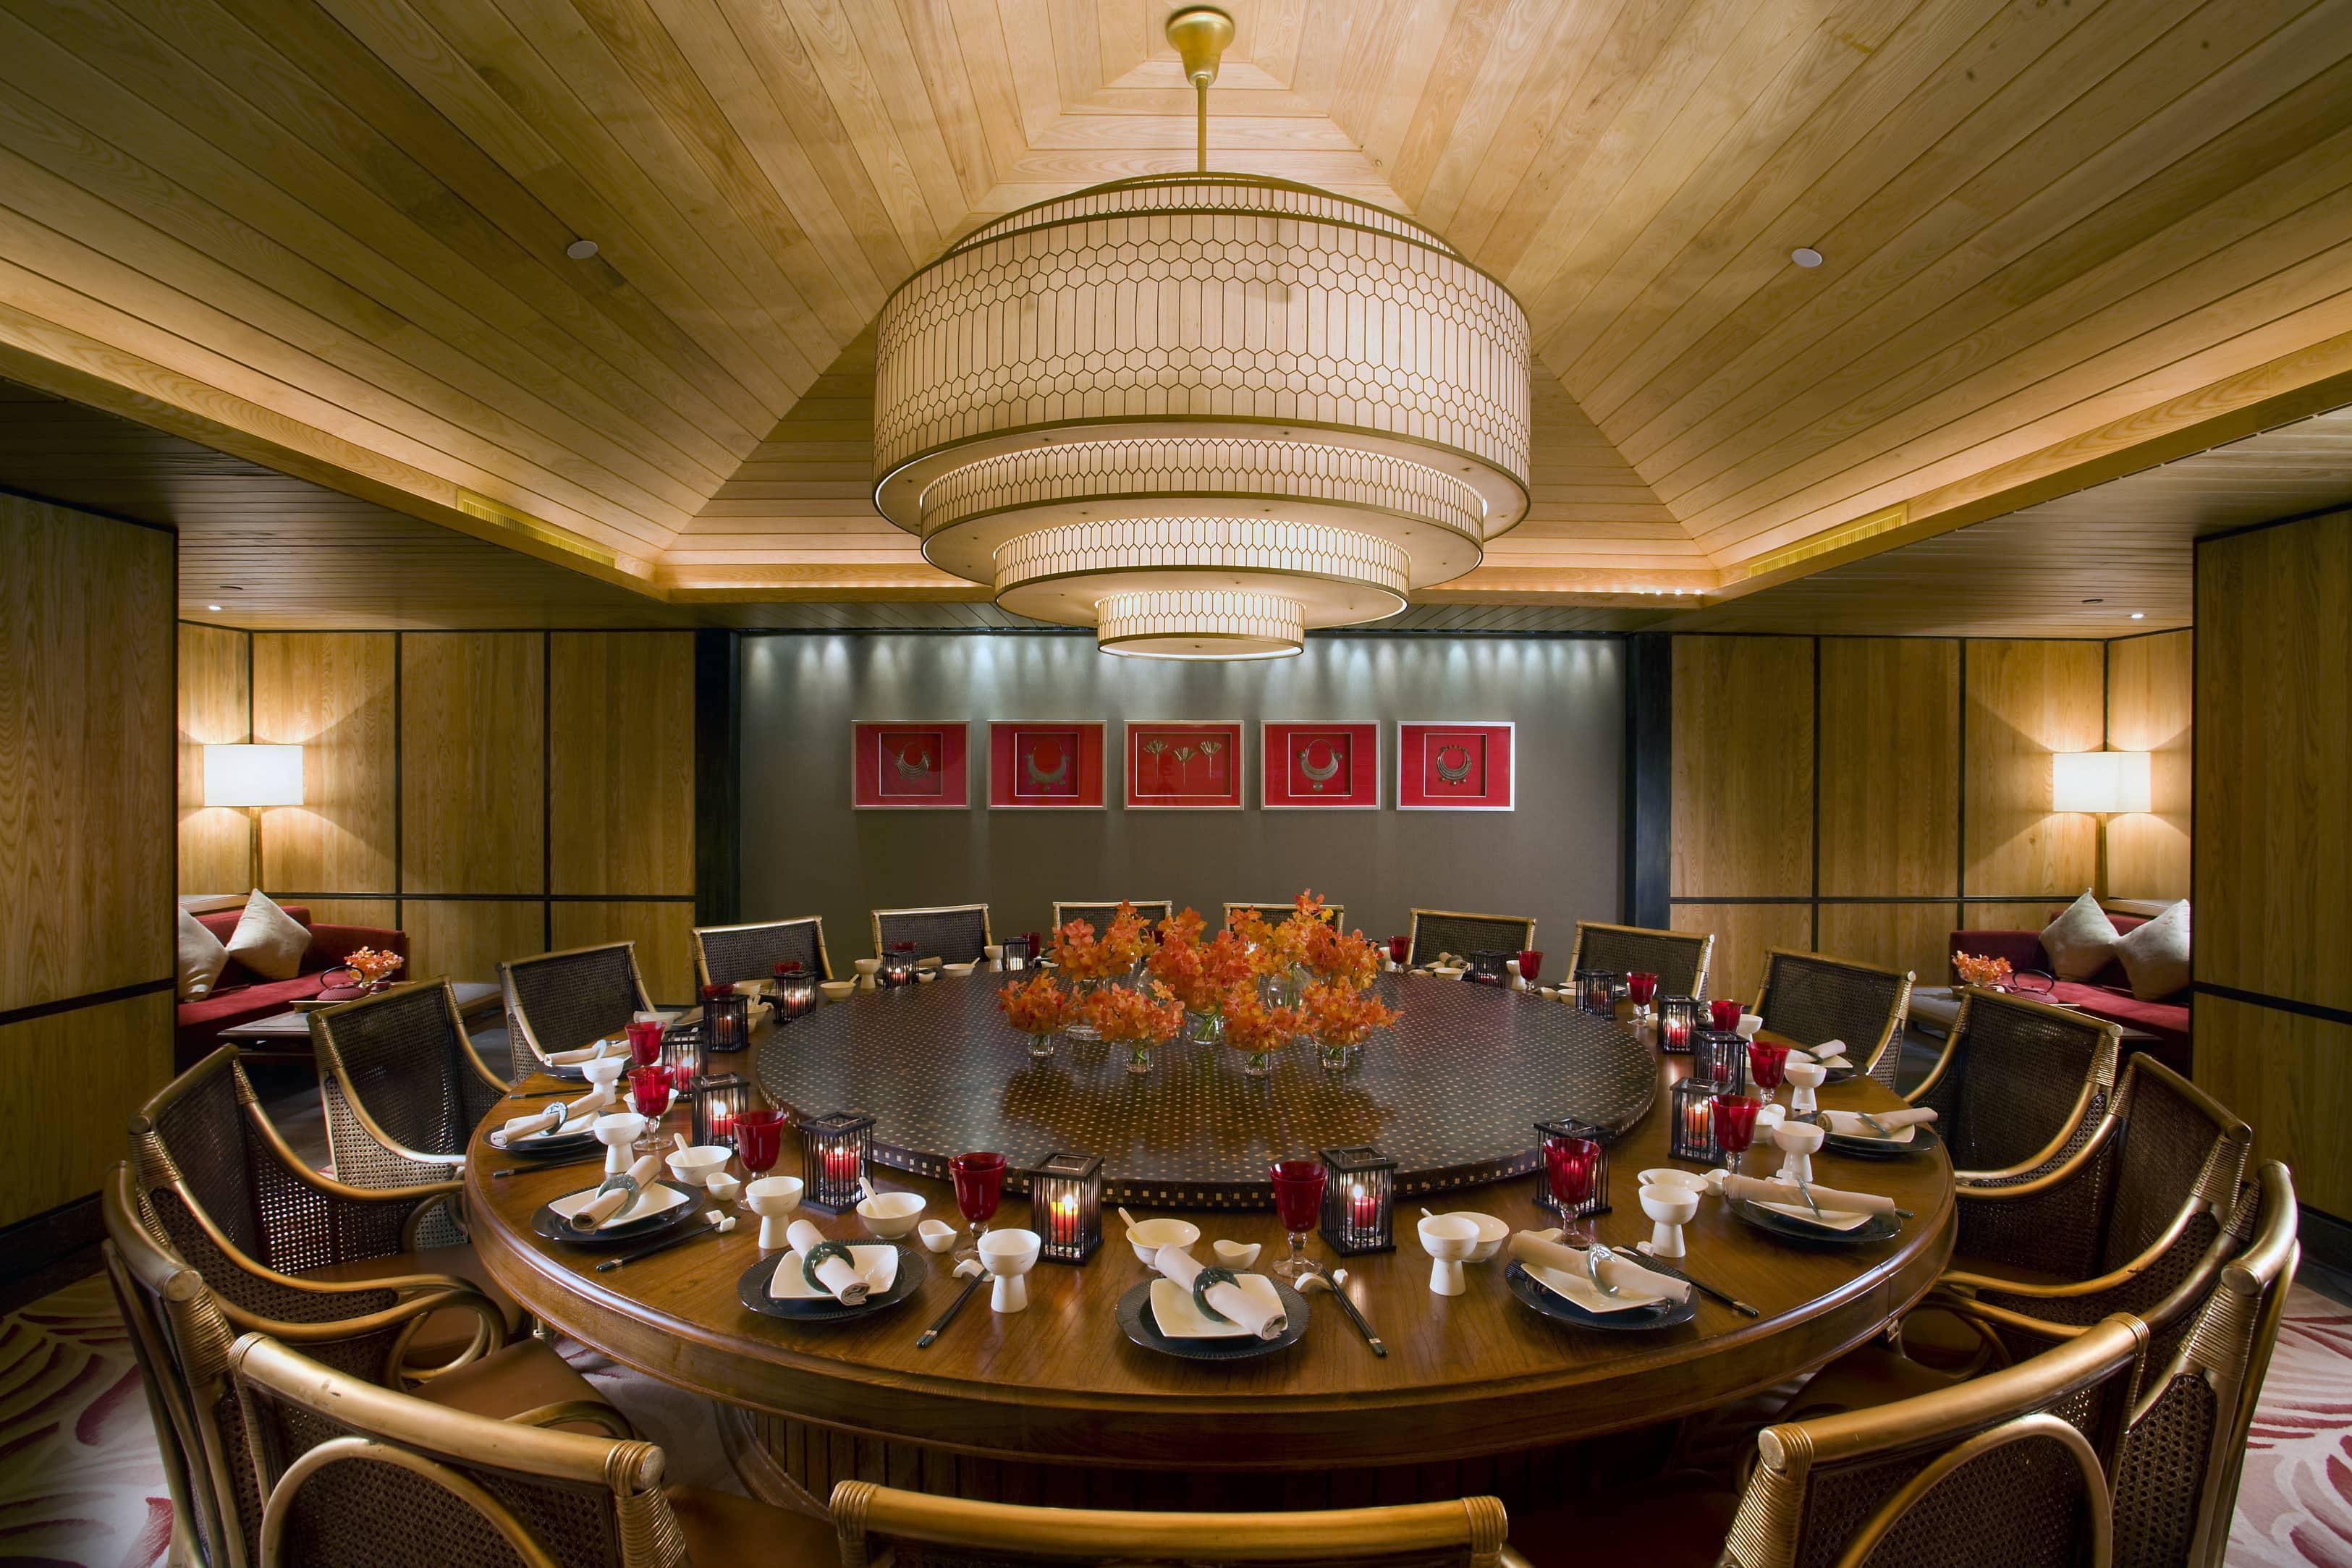 Sanya hotel photo gallery mandarin oriental sanya - Private dining room ...